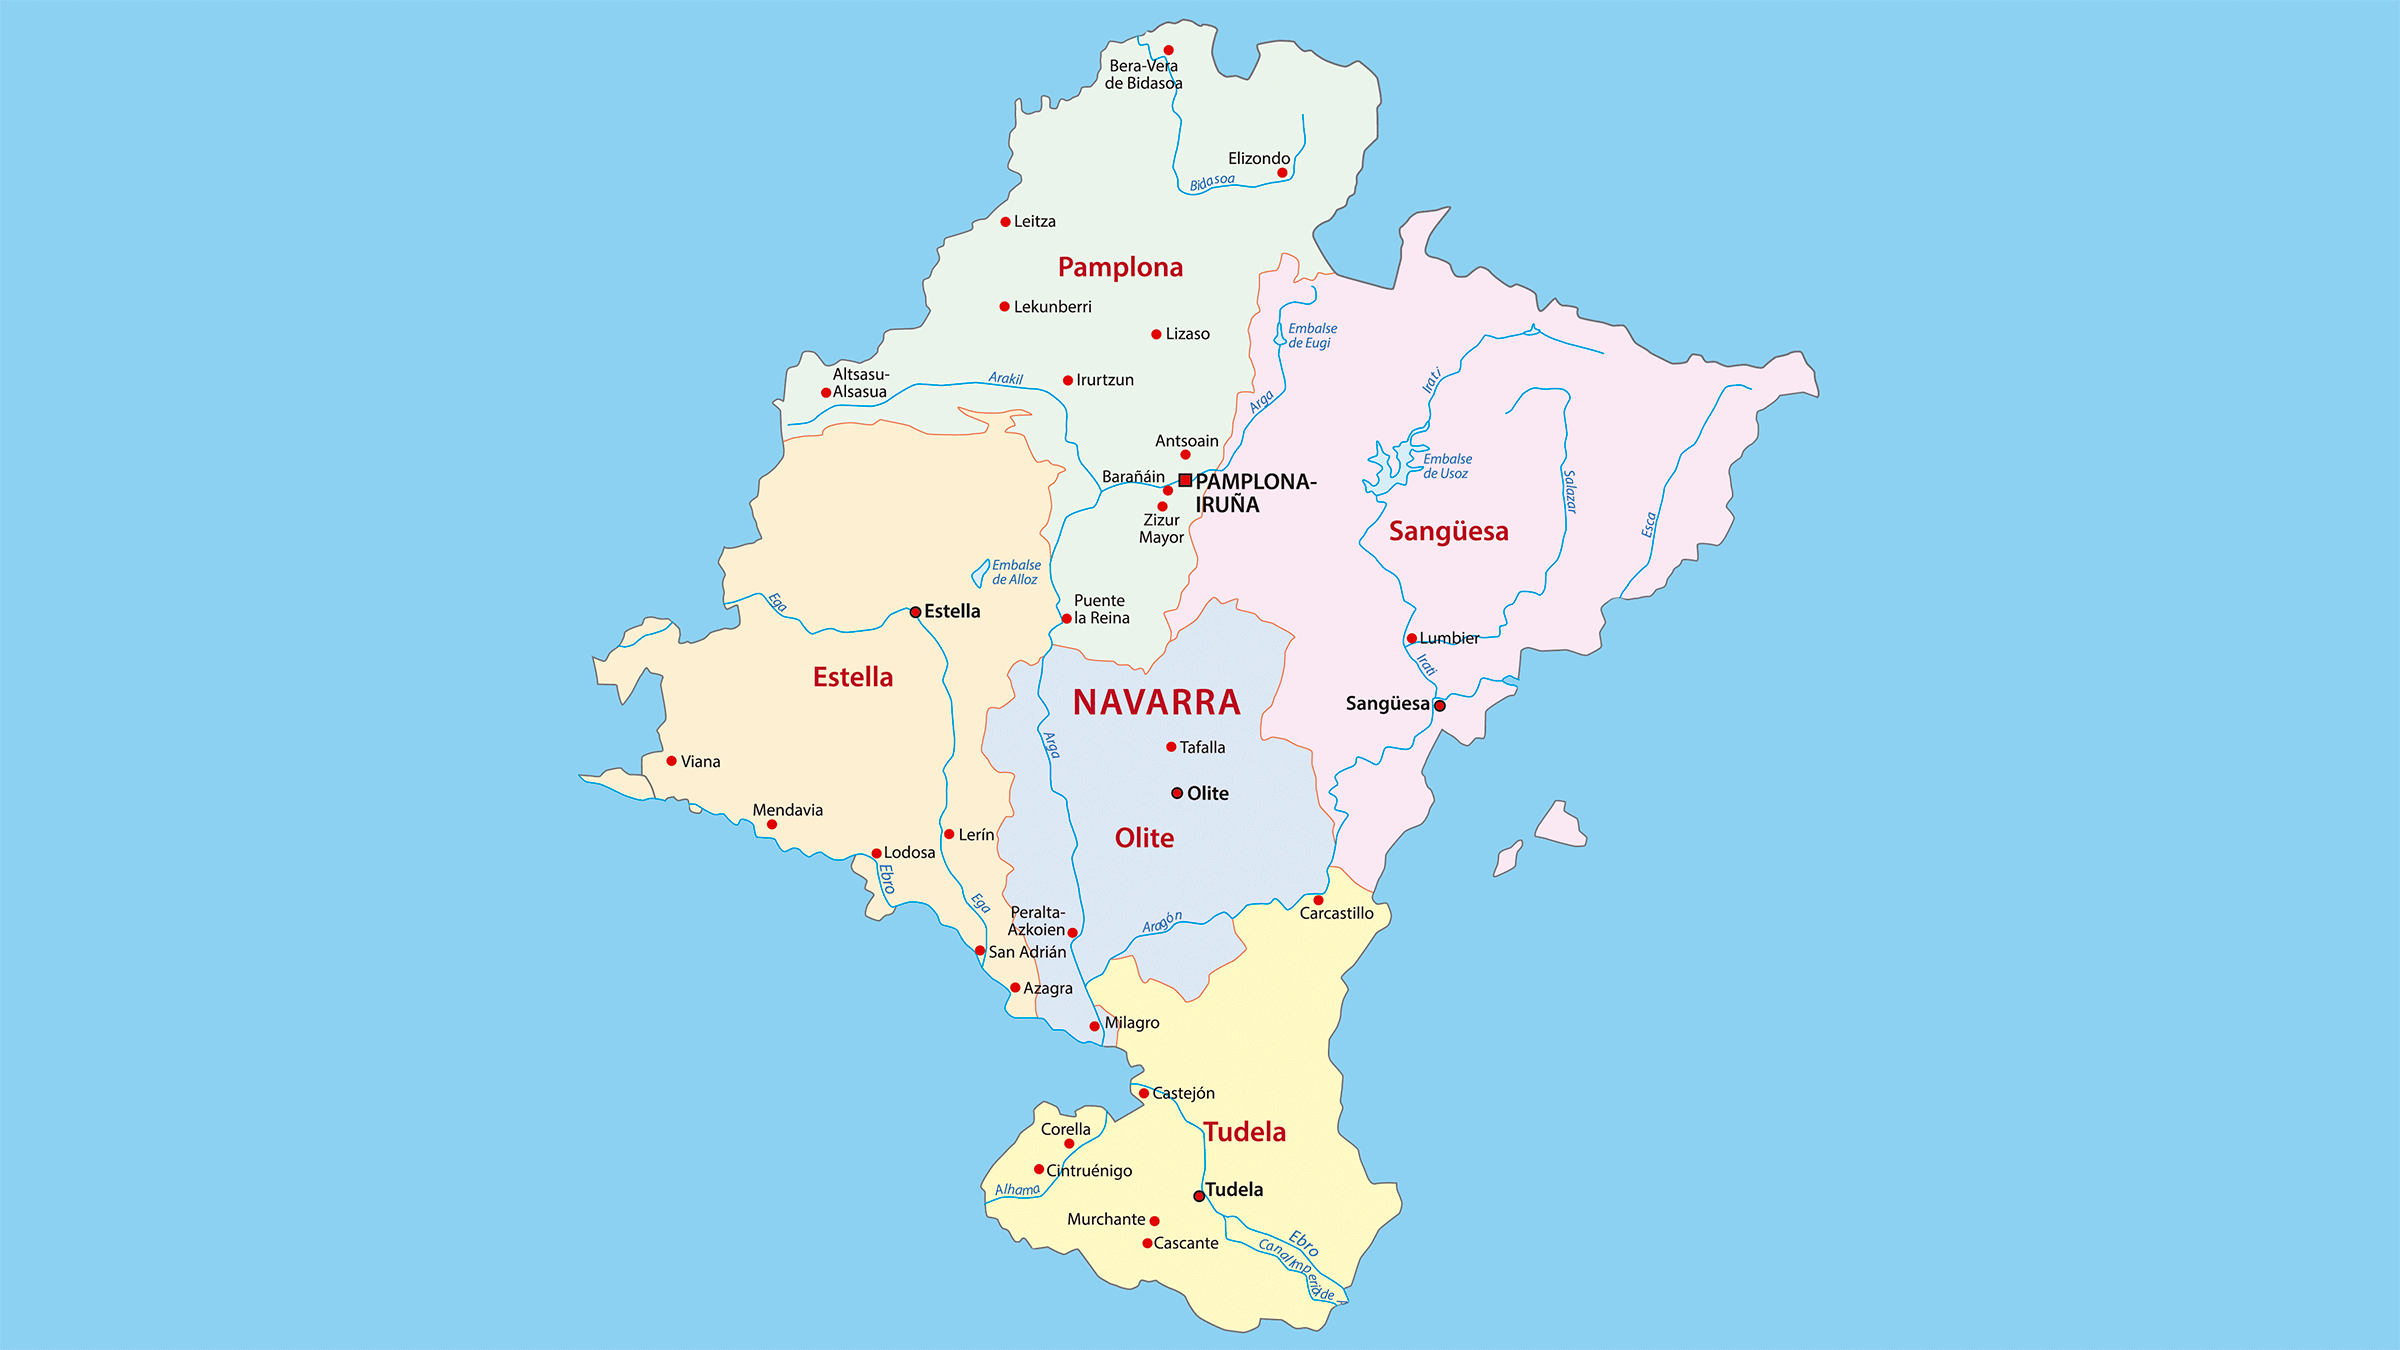 Mapa turístico de Navarra